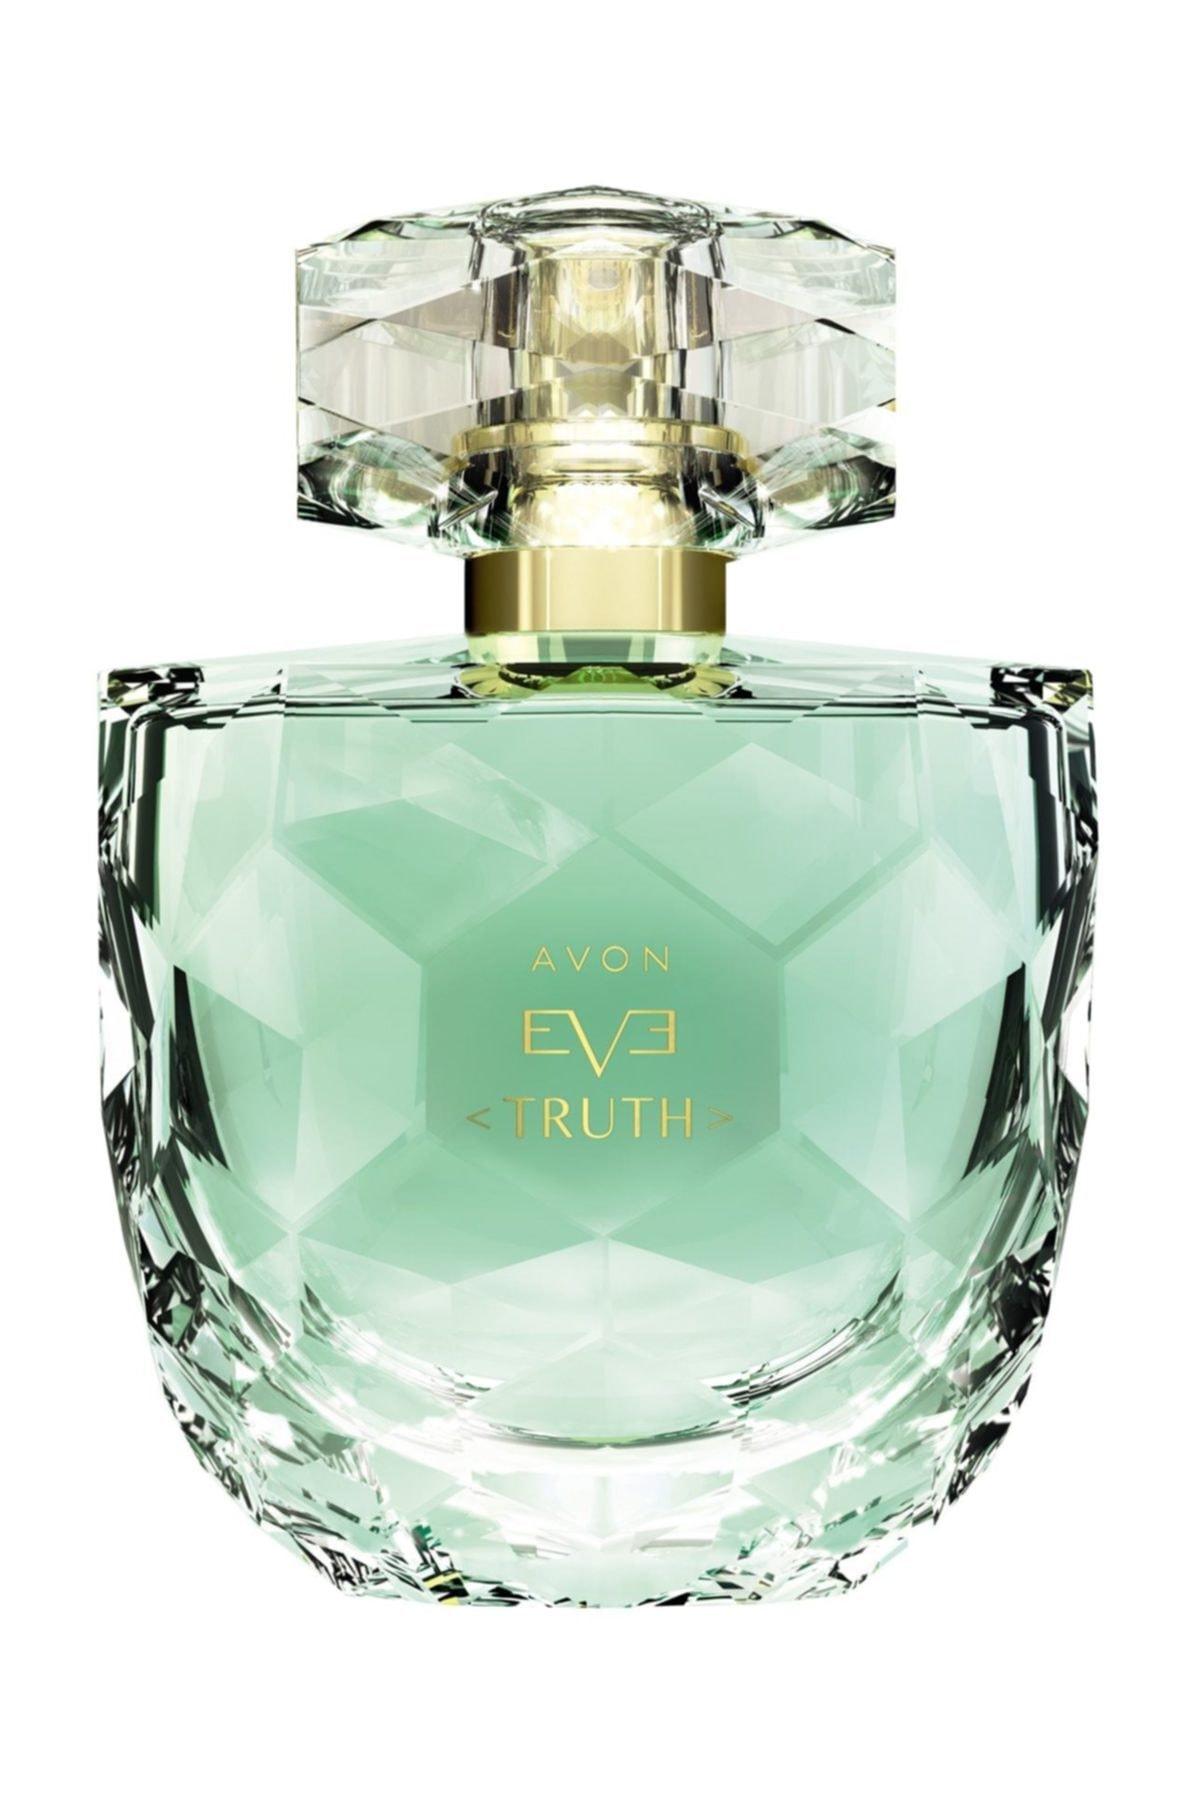 100 Original Avon Home Truth Women Perfume Edp 50 Ml Modal Sexy Passionate Pleasant Impressive New Season Brand Women for Economic недорого